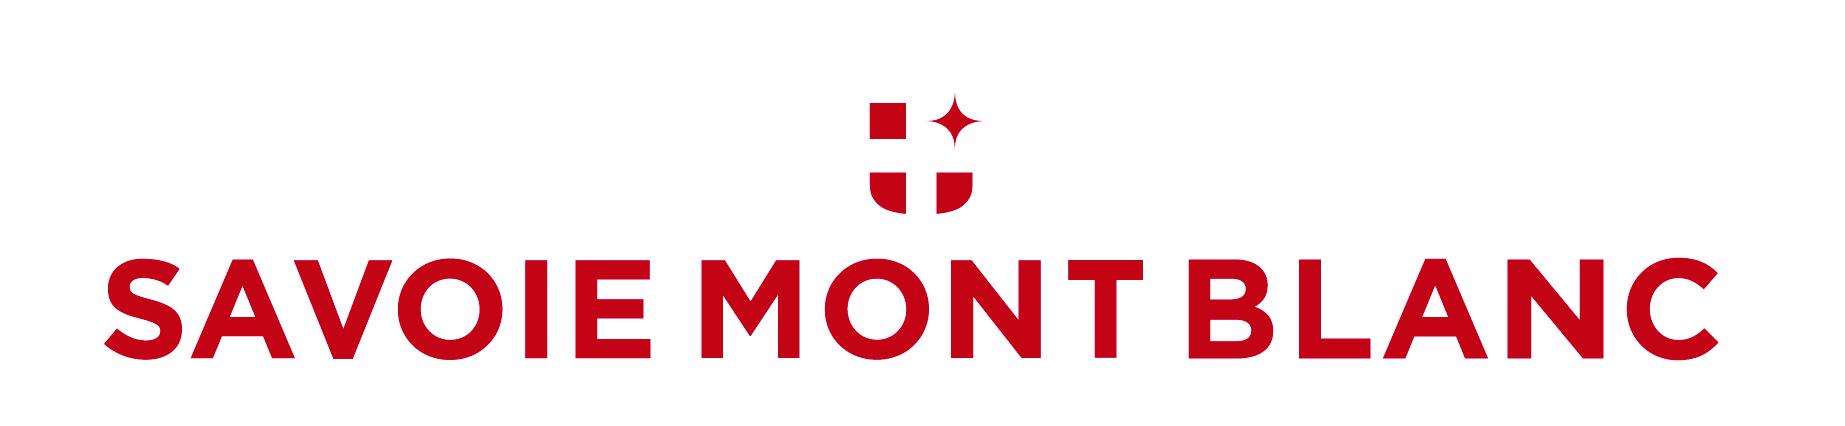 Conseil Savoie Mont-Blanc